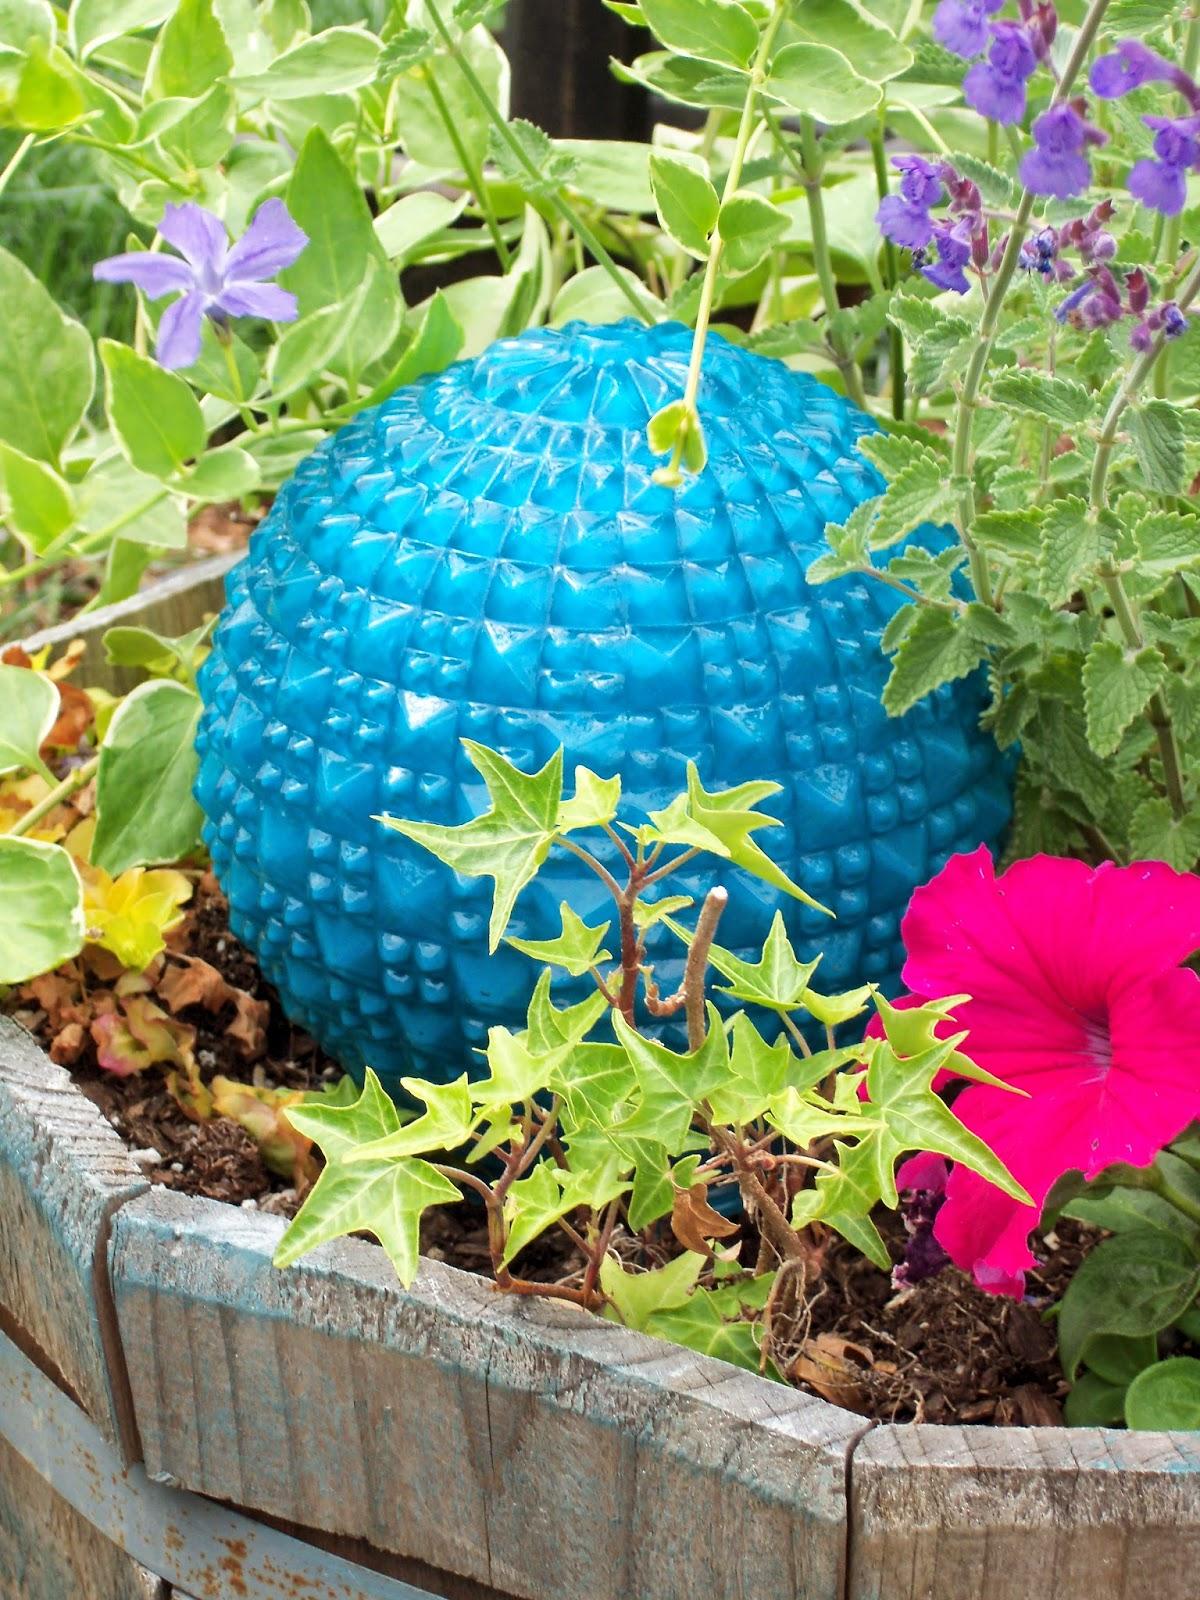 Make the best of things diy garden art super easy glass for Making things for the garden